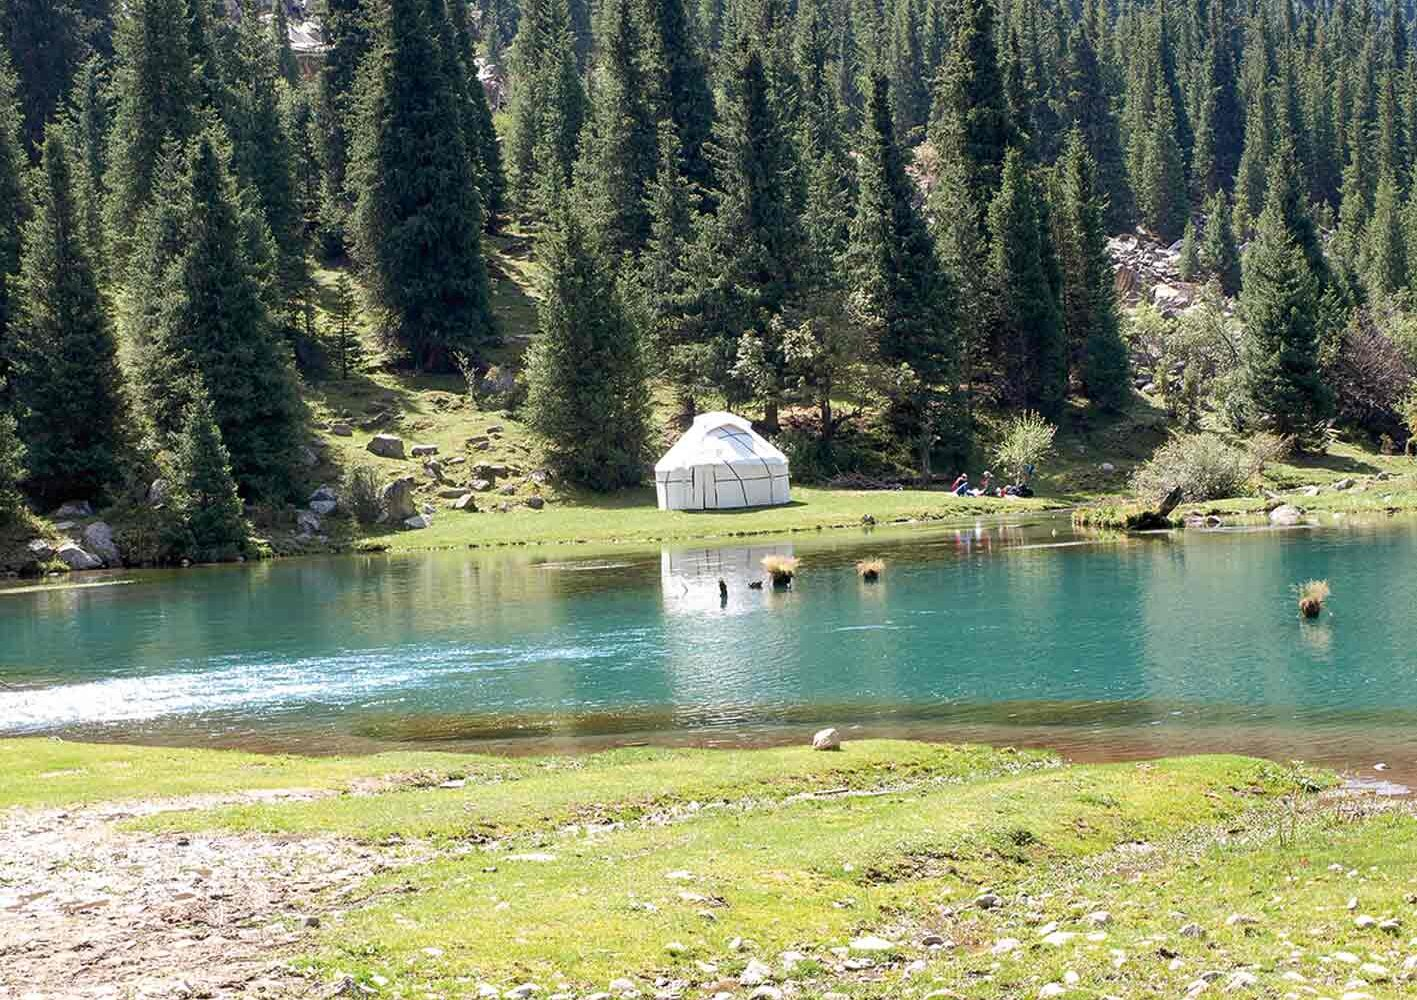 Suttu-Bulak-See, Wanderung am 17. Tag